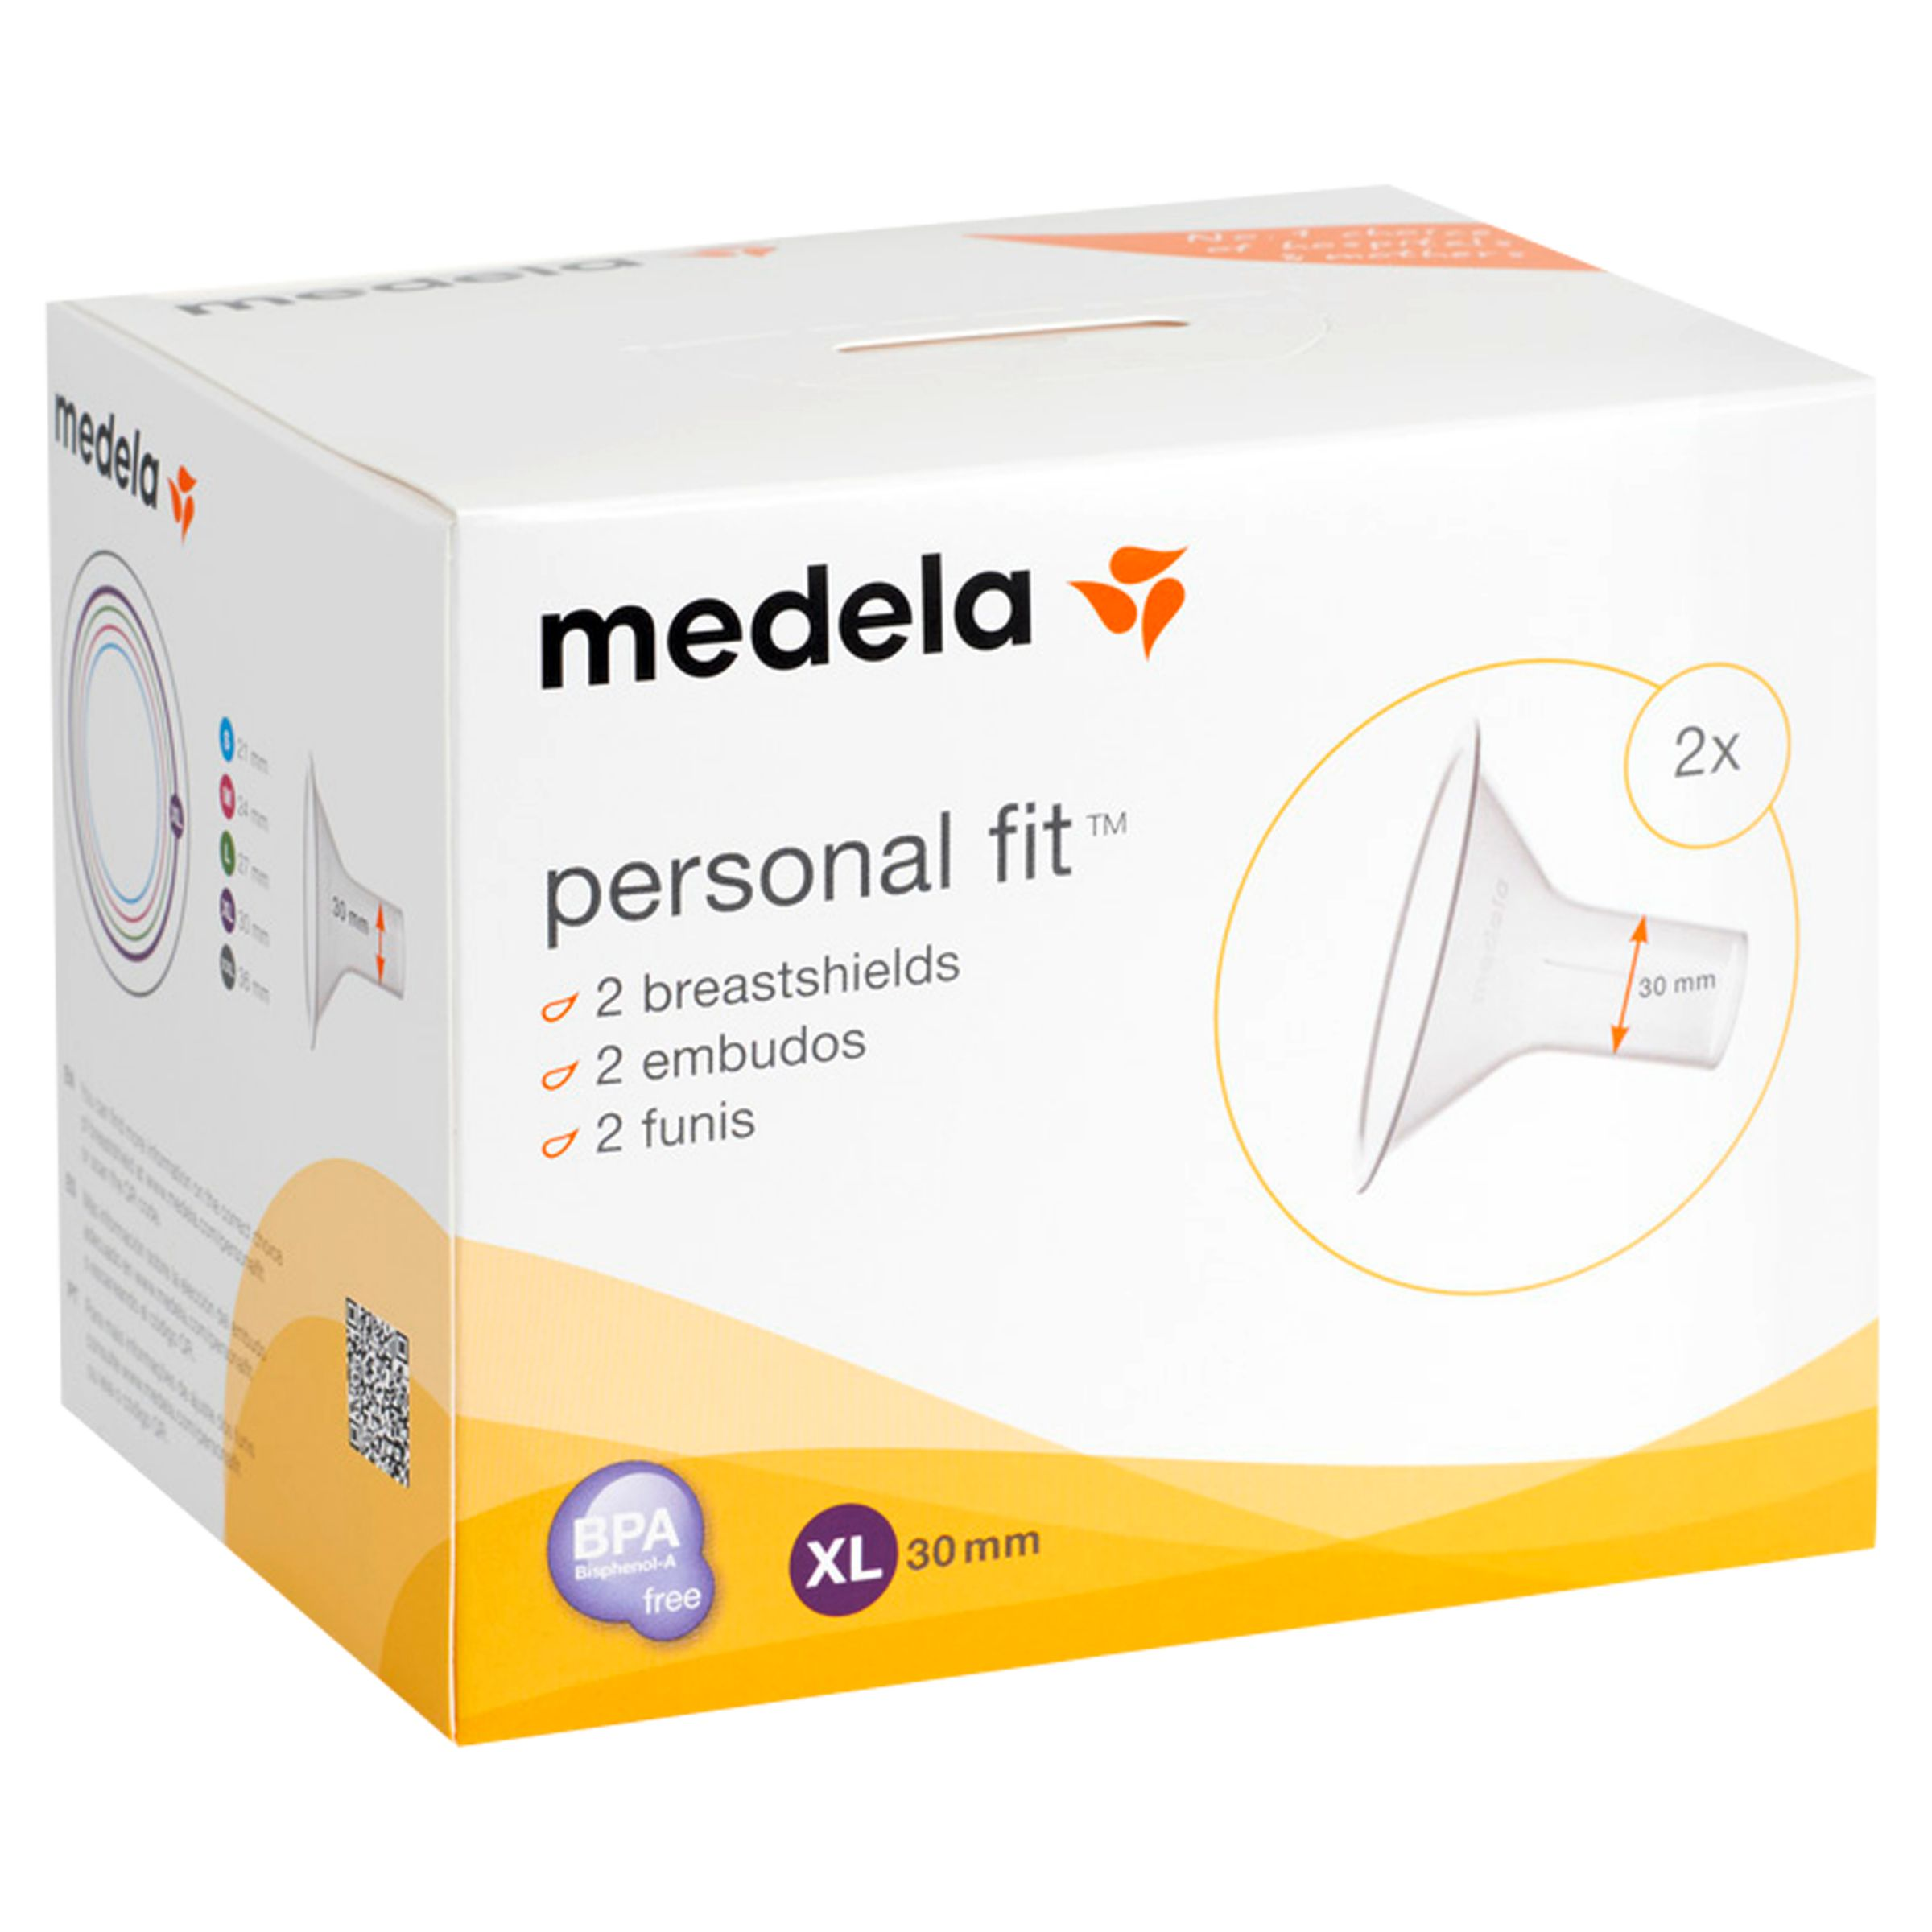 Medela Medela PersonalFit Breast Shield